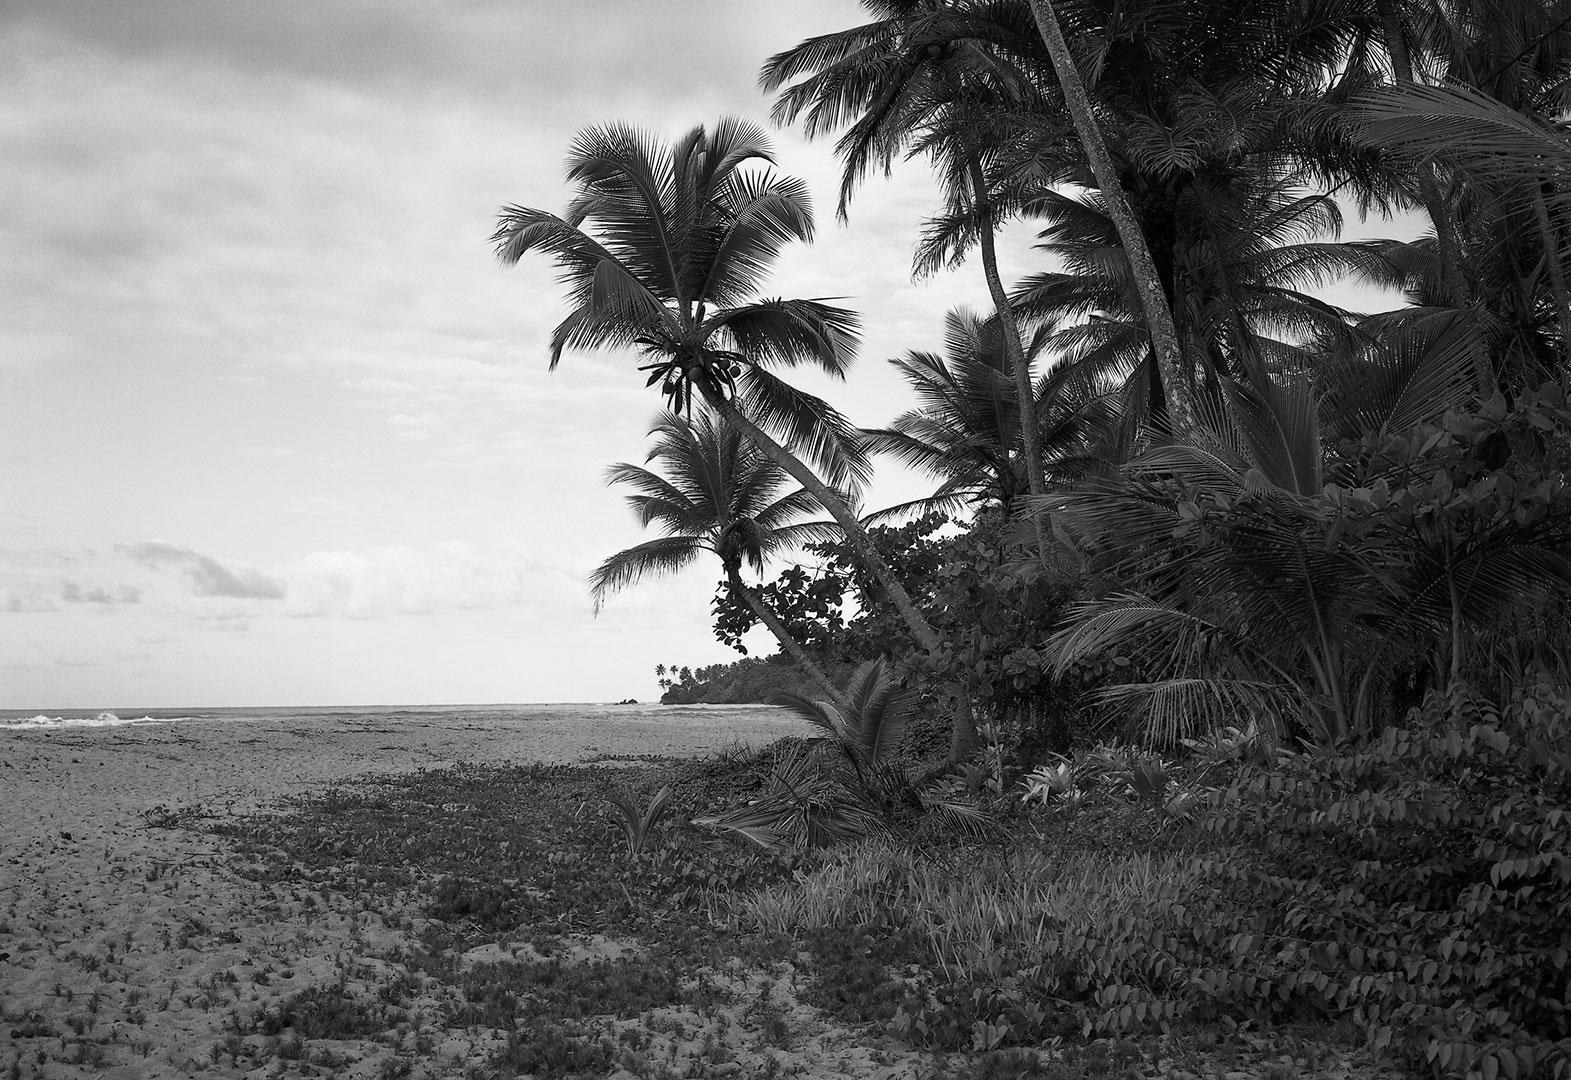 Stéphanie Gygax – Useful Landscape